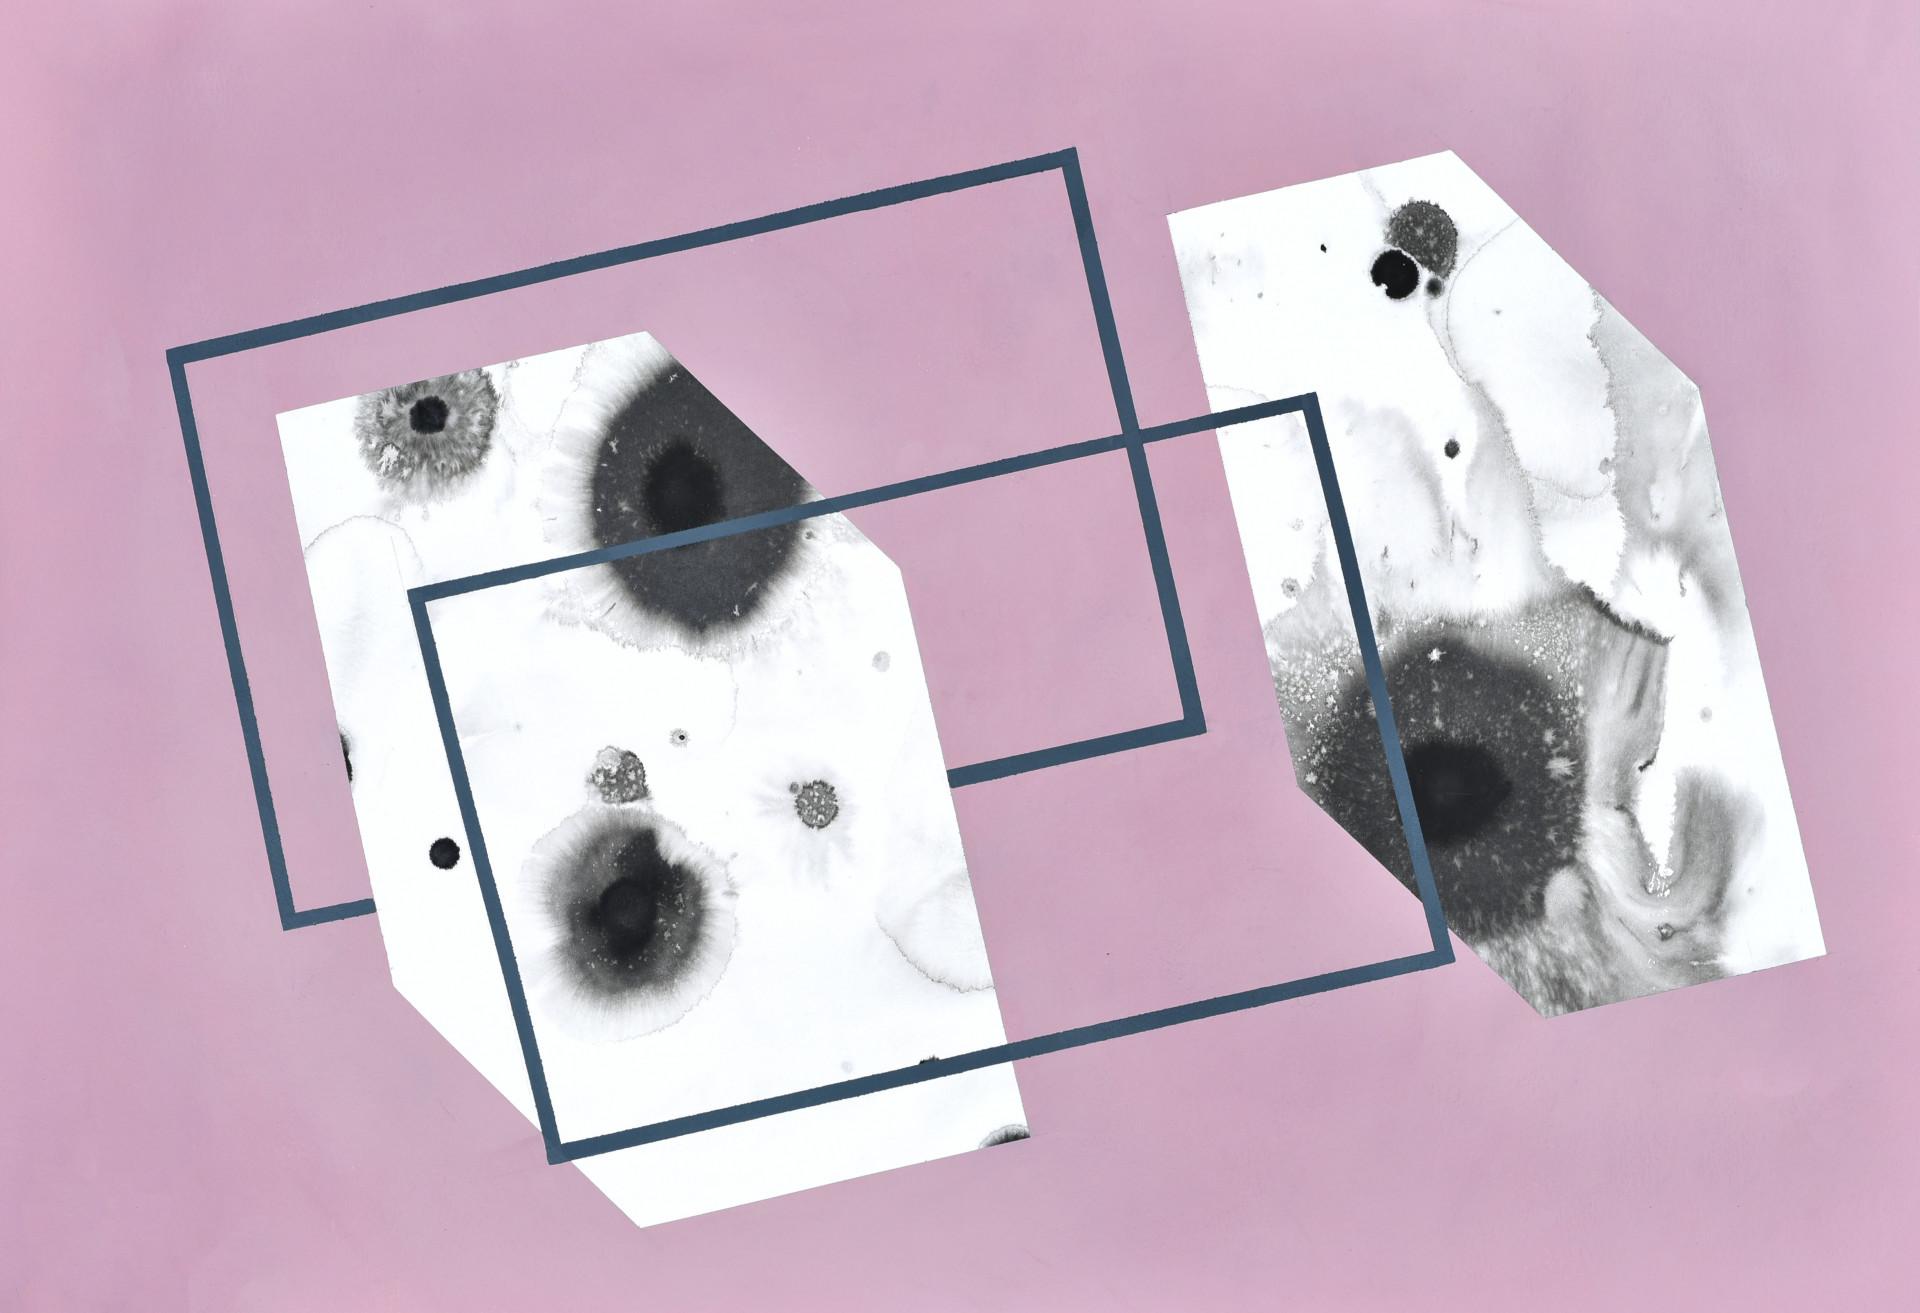 Axppereil / Genus – C4DEY 1